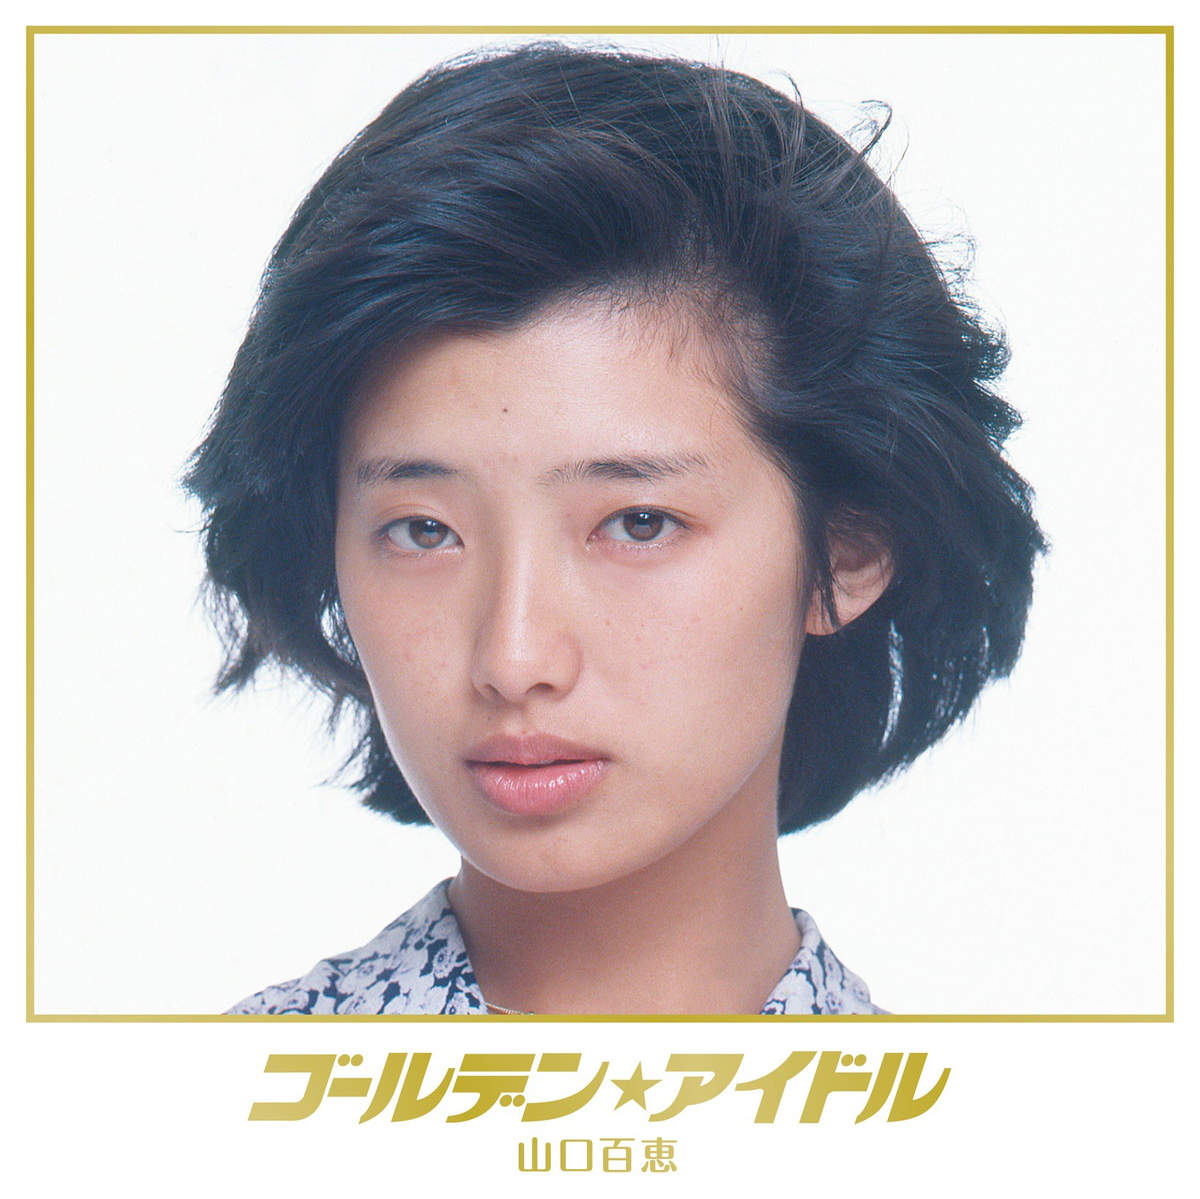 20171020.0054.12 Momoe Yamaguchi - Golden Idol (2015) cover.jpg